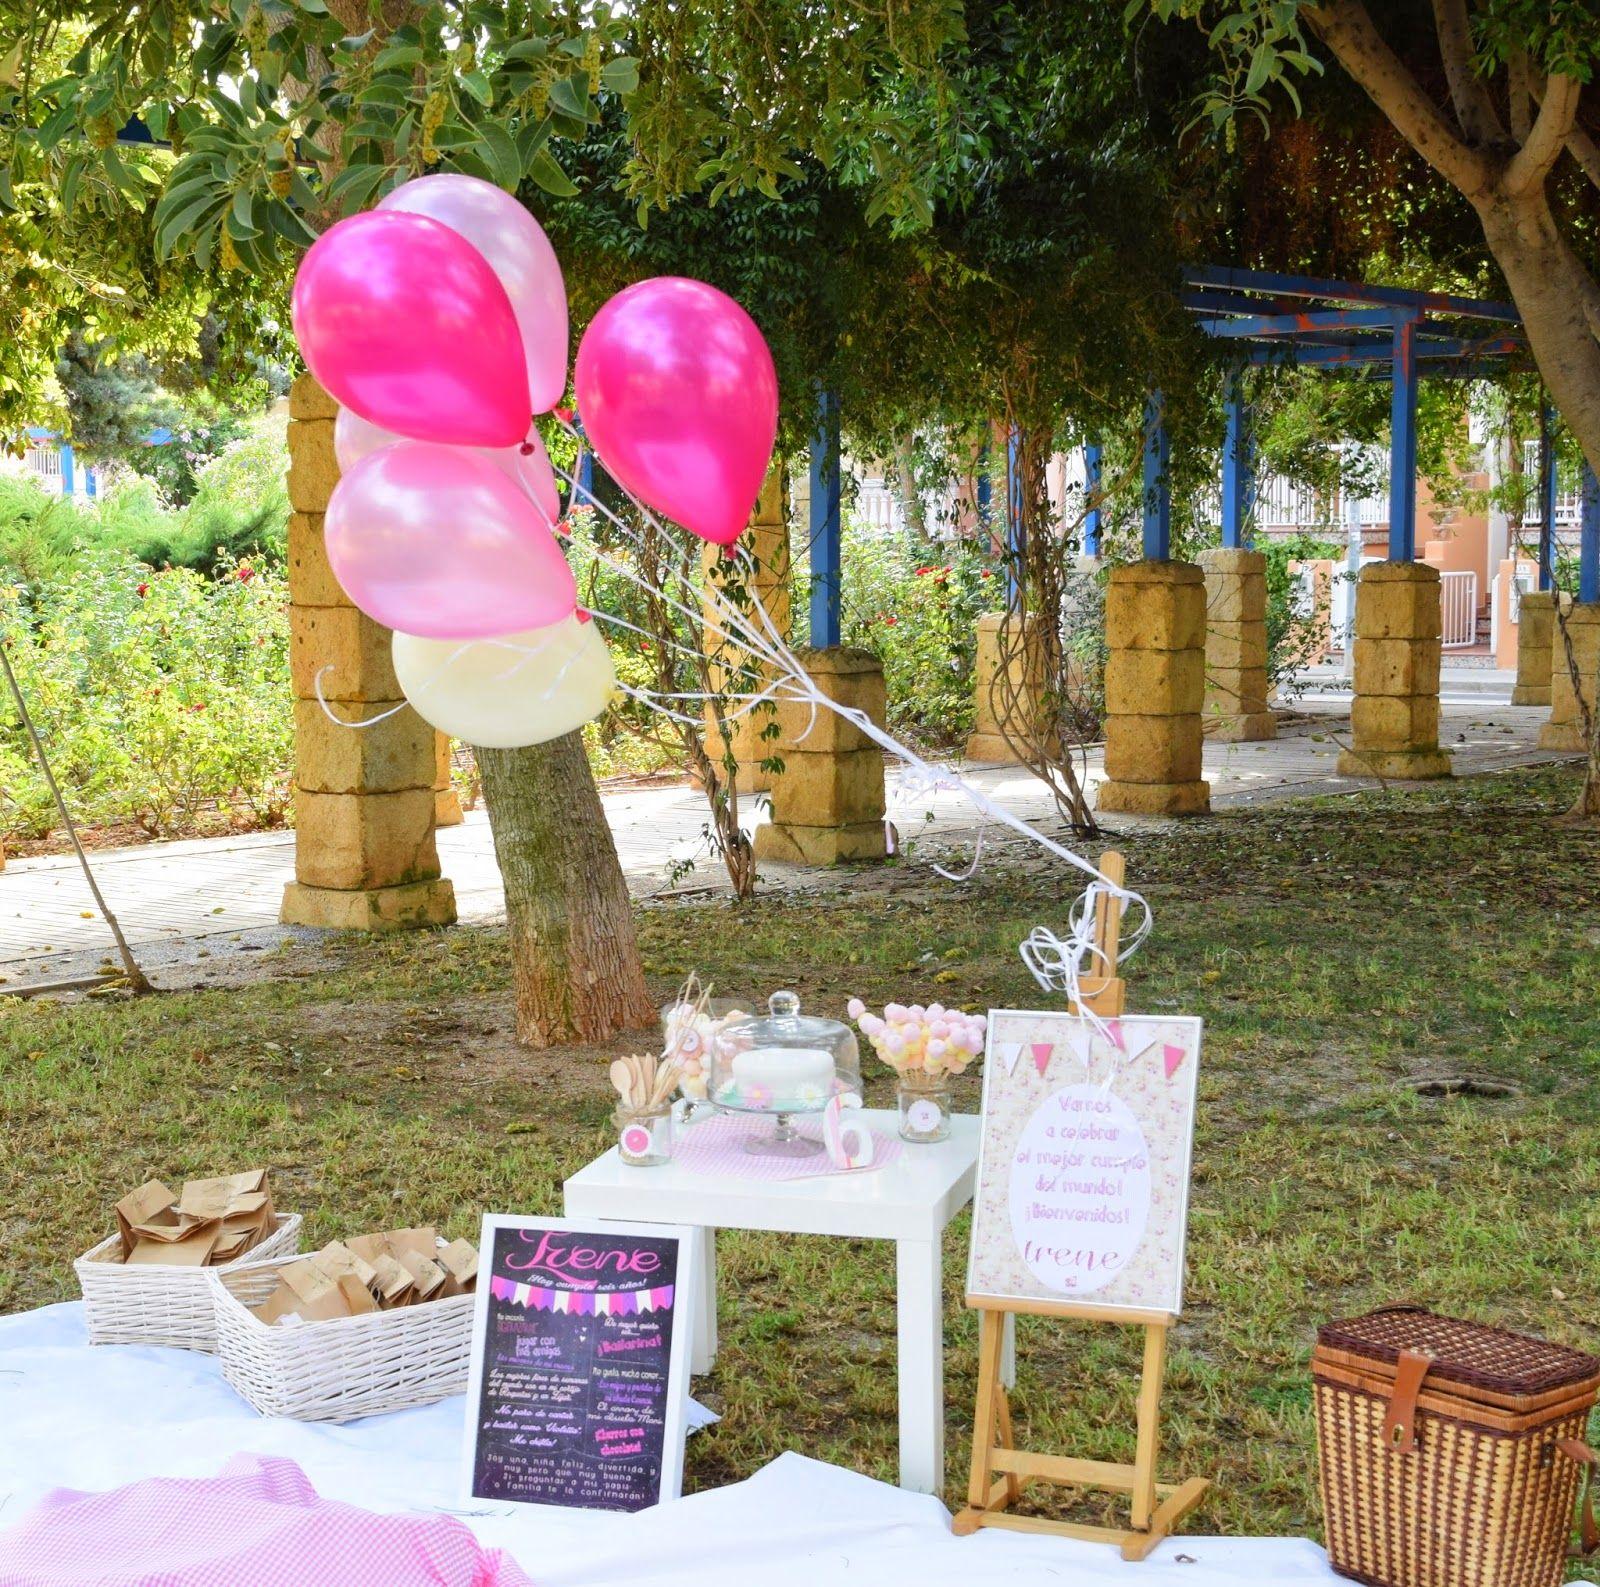 16 Granja Yarda Animales Cajas ~ Picnic Llevar Comida Sorpresa Fiesta Cumpleaños Goods Of Every Description Are Available Home & Garden Kitchen, Dining & Bar